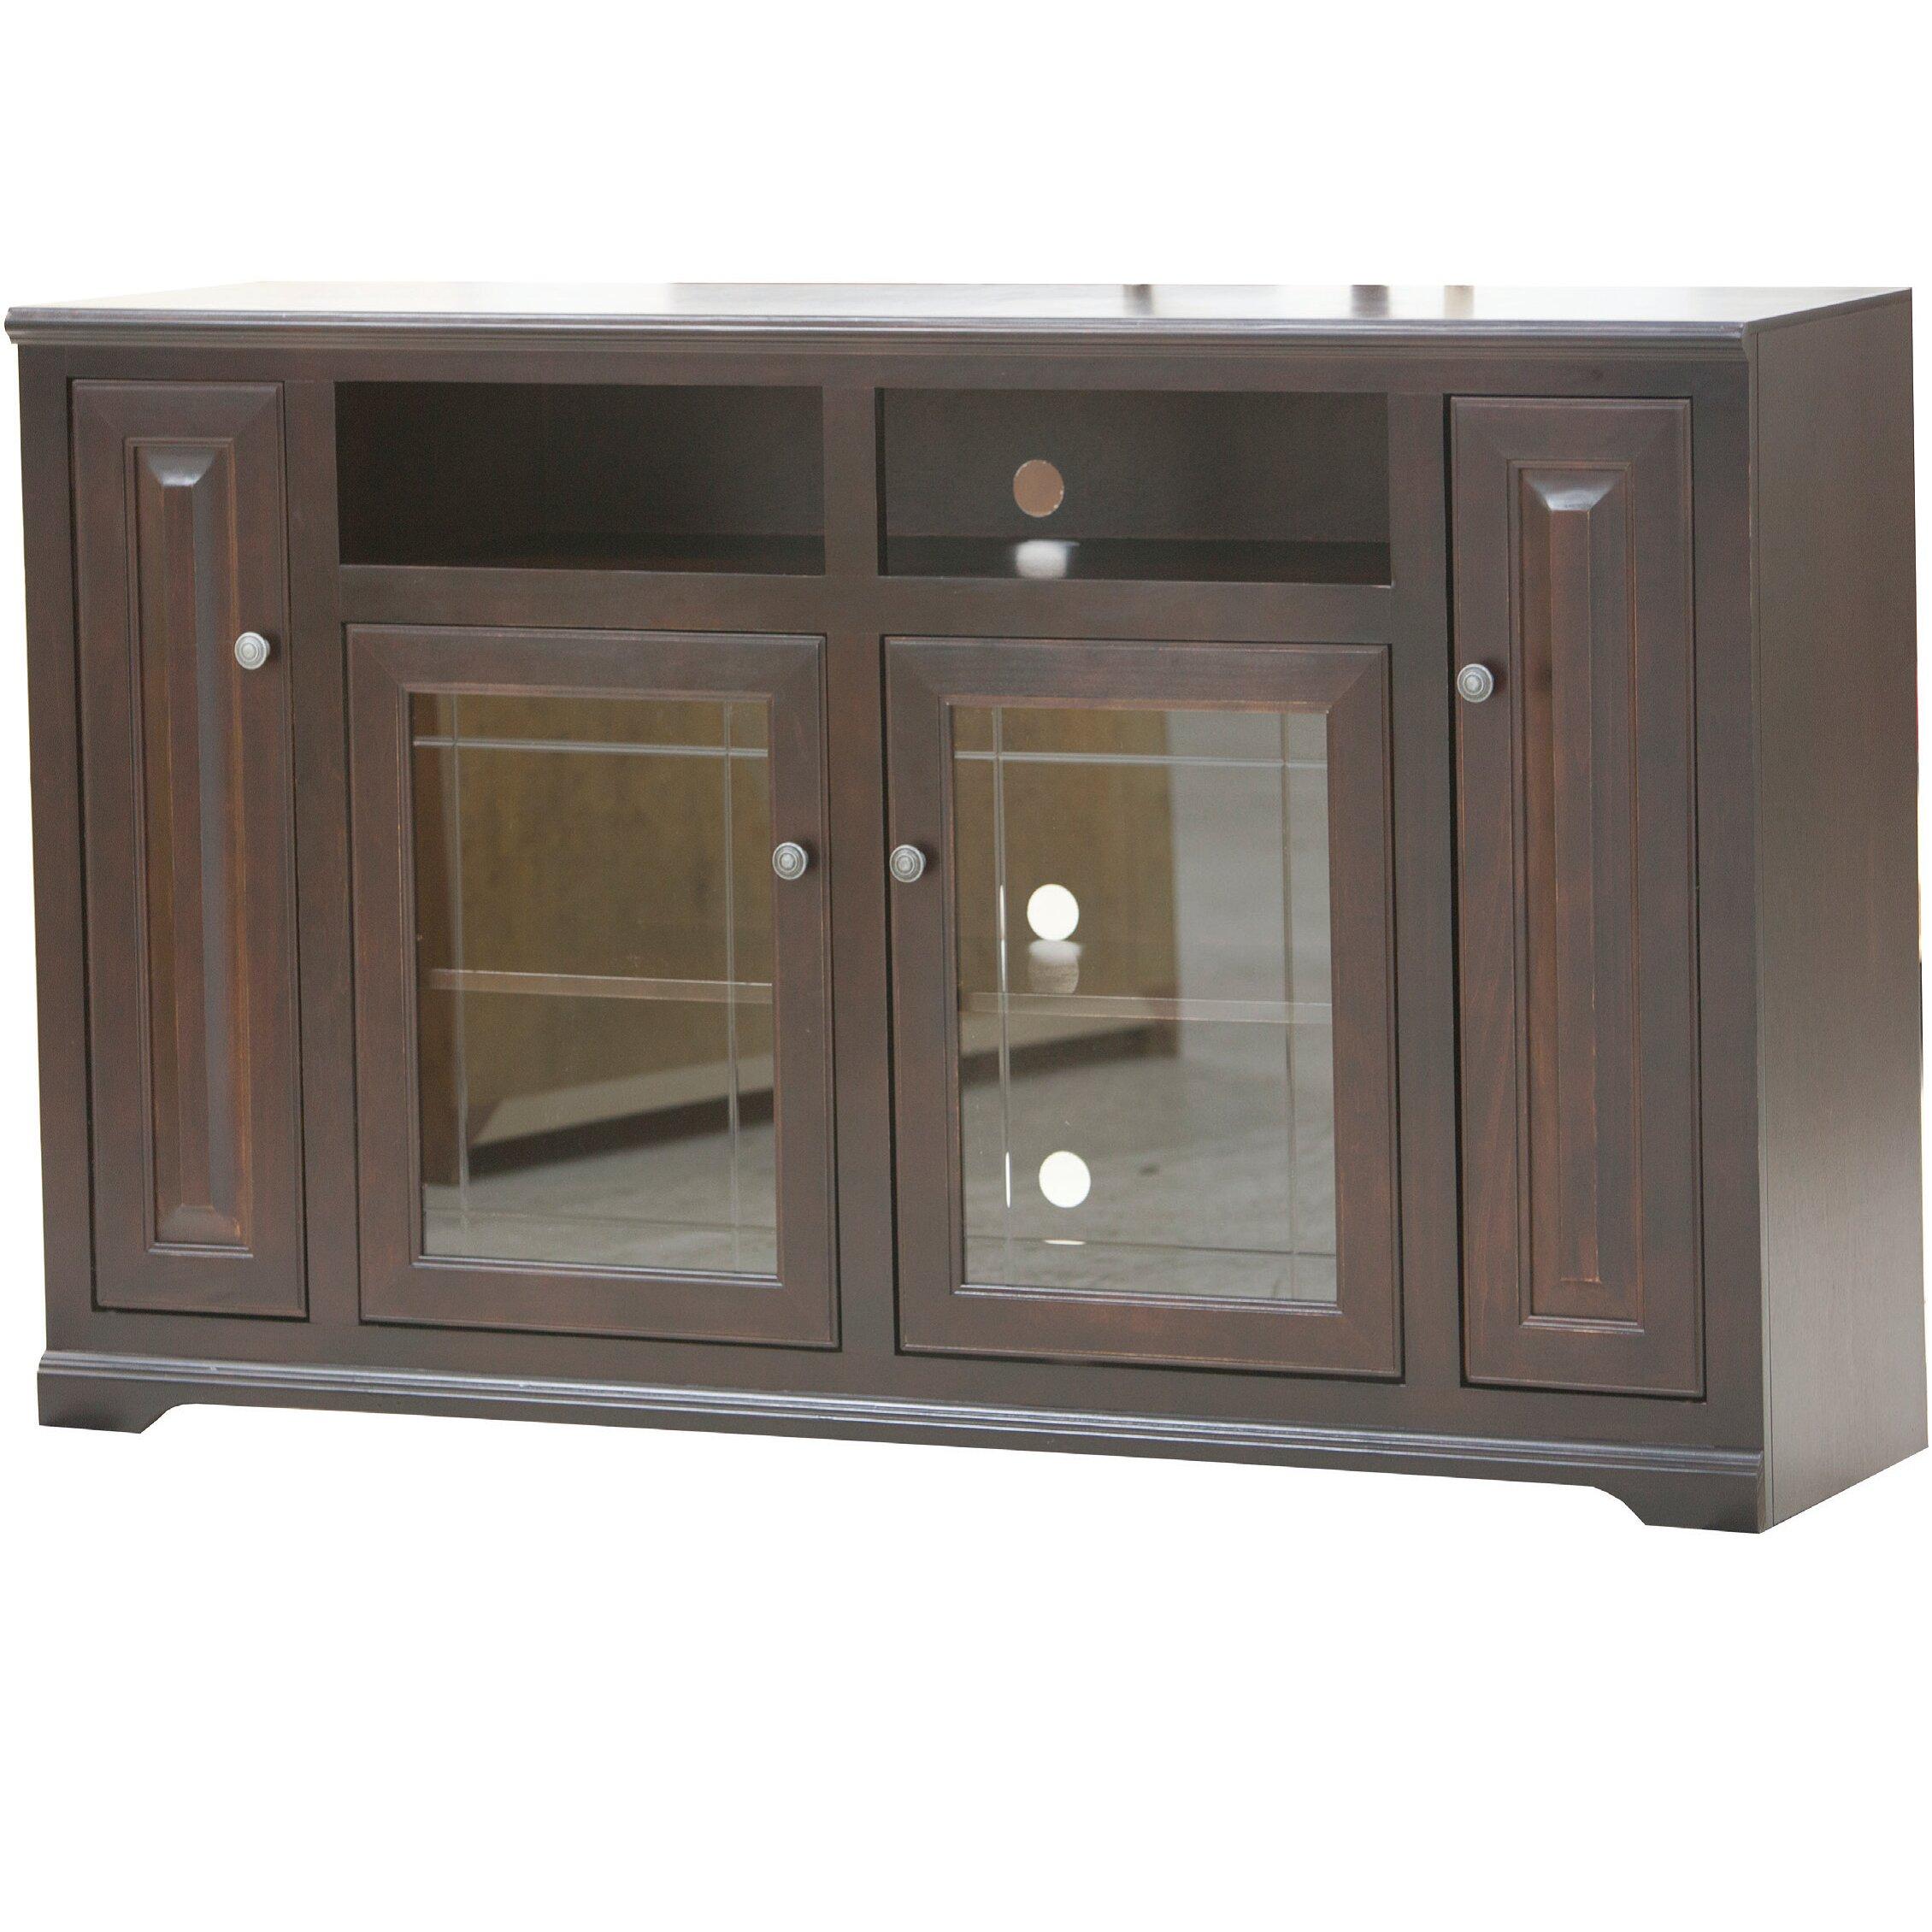 Eagle Furniture Manufacturing Savannah Tv Stand Reviews Wayfair